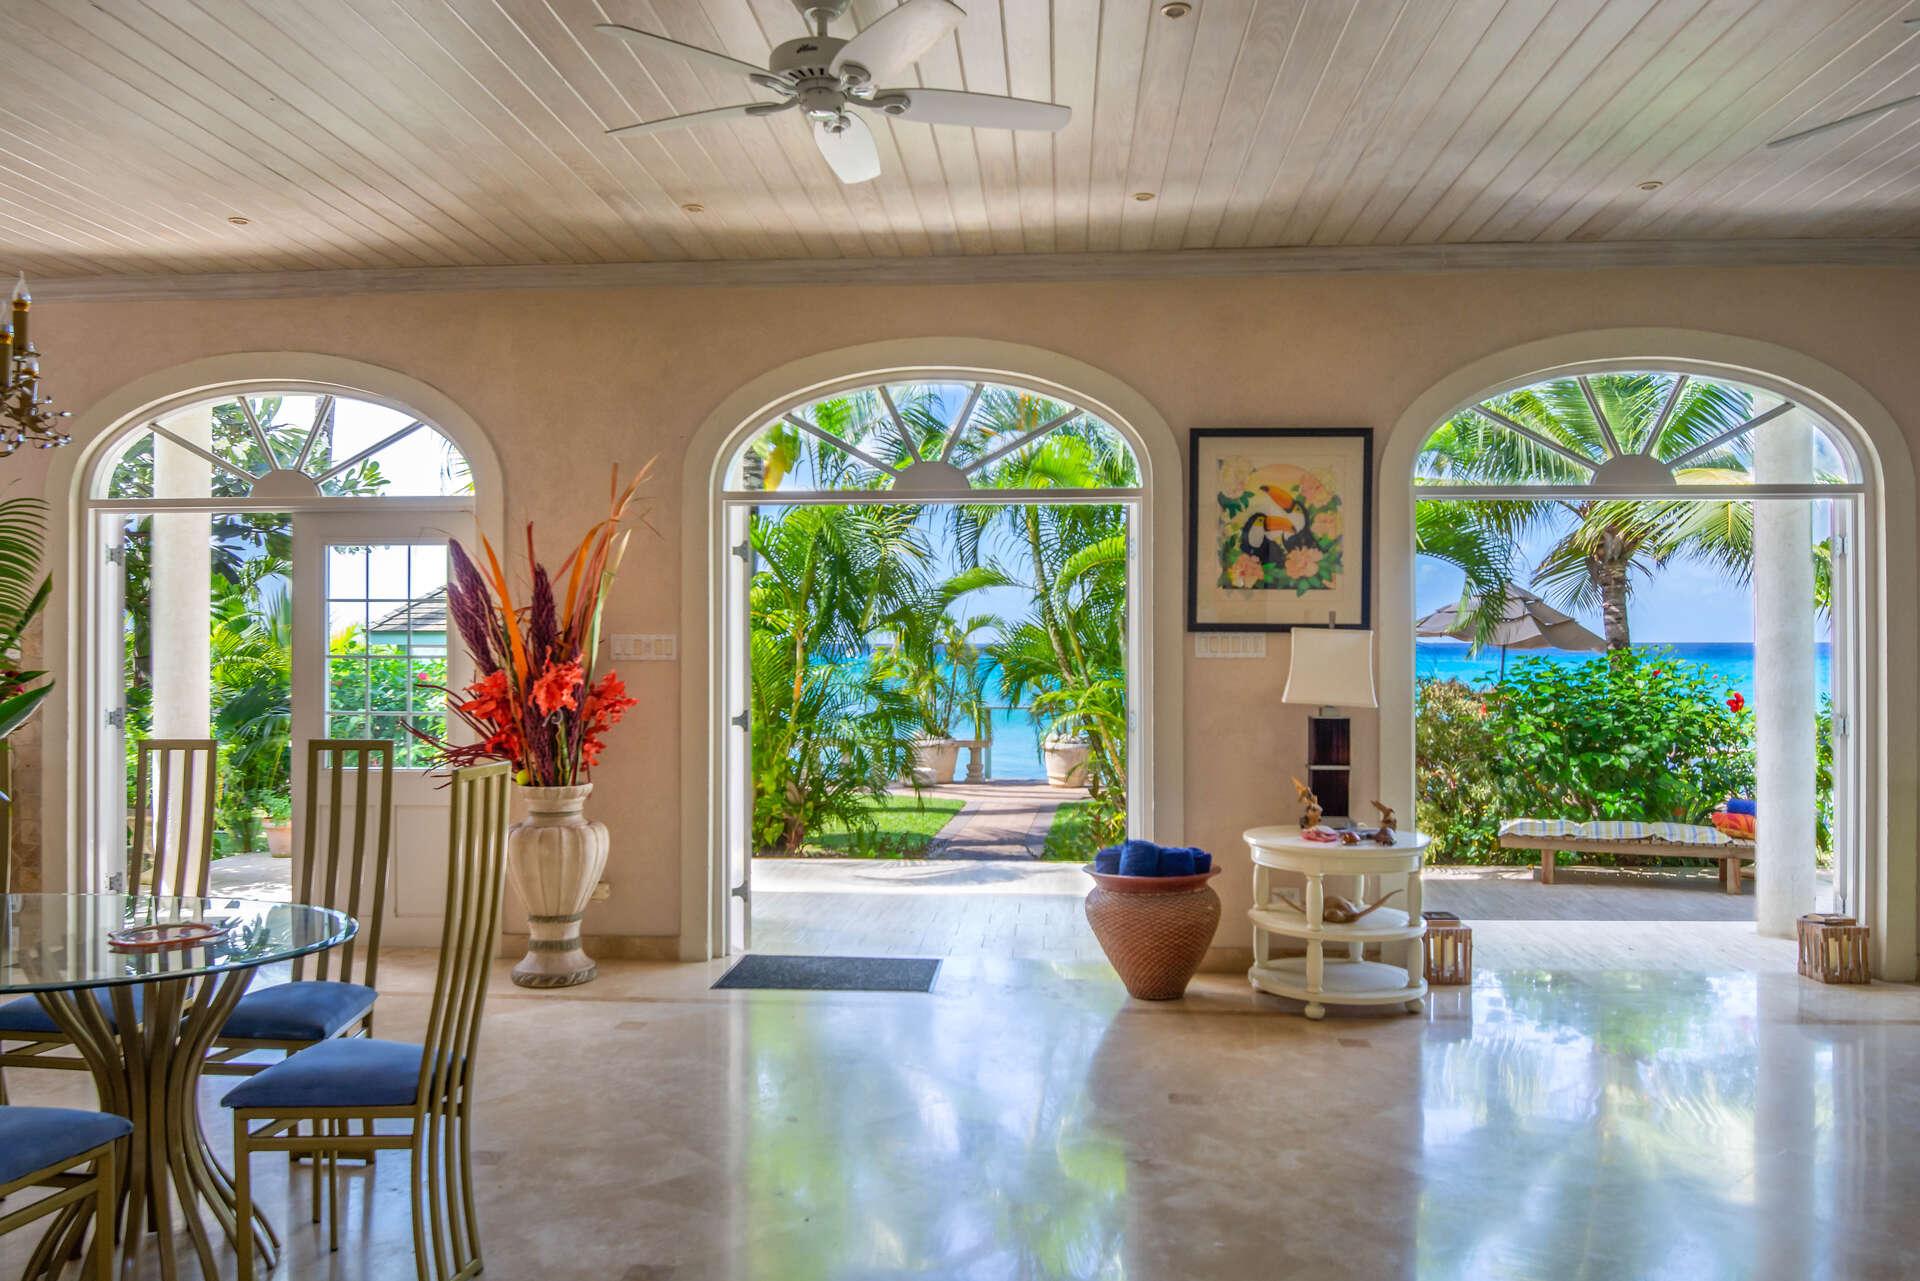 Luxury villa rentals caribbean - Barbados - St james - Fitts village - Ebbtide - Image 1/37